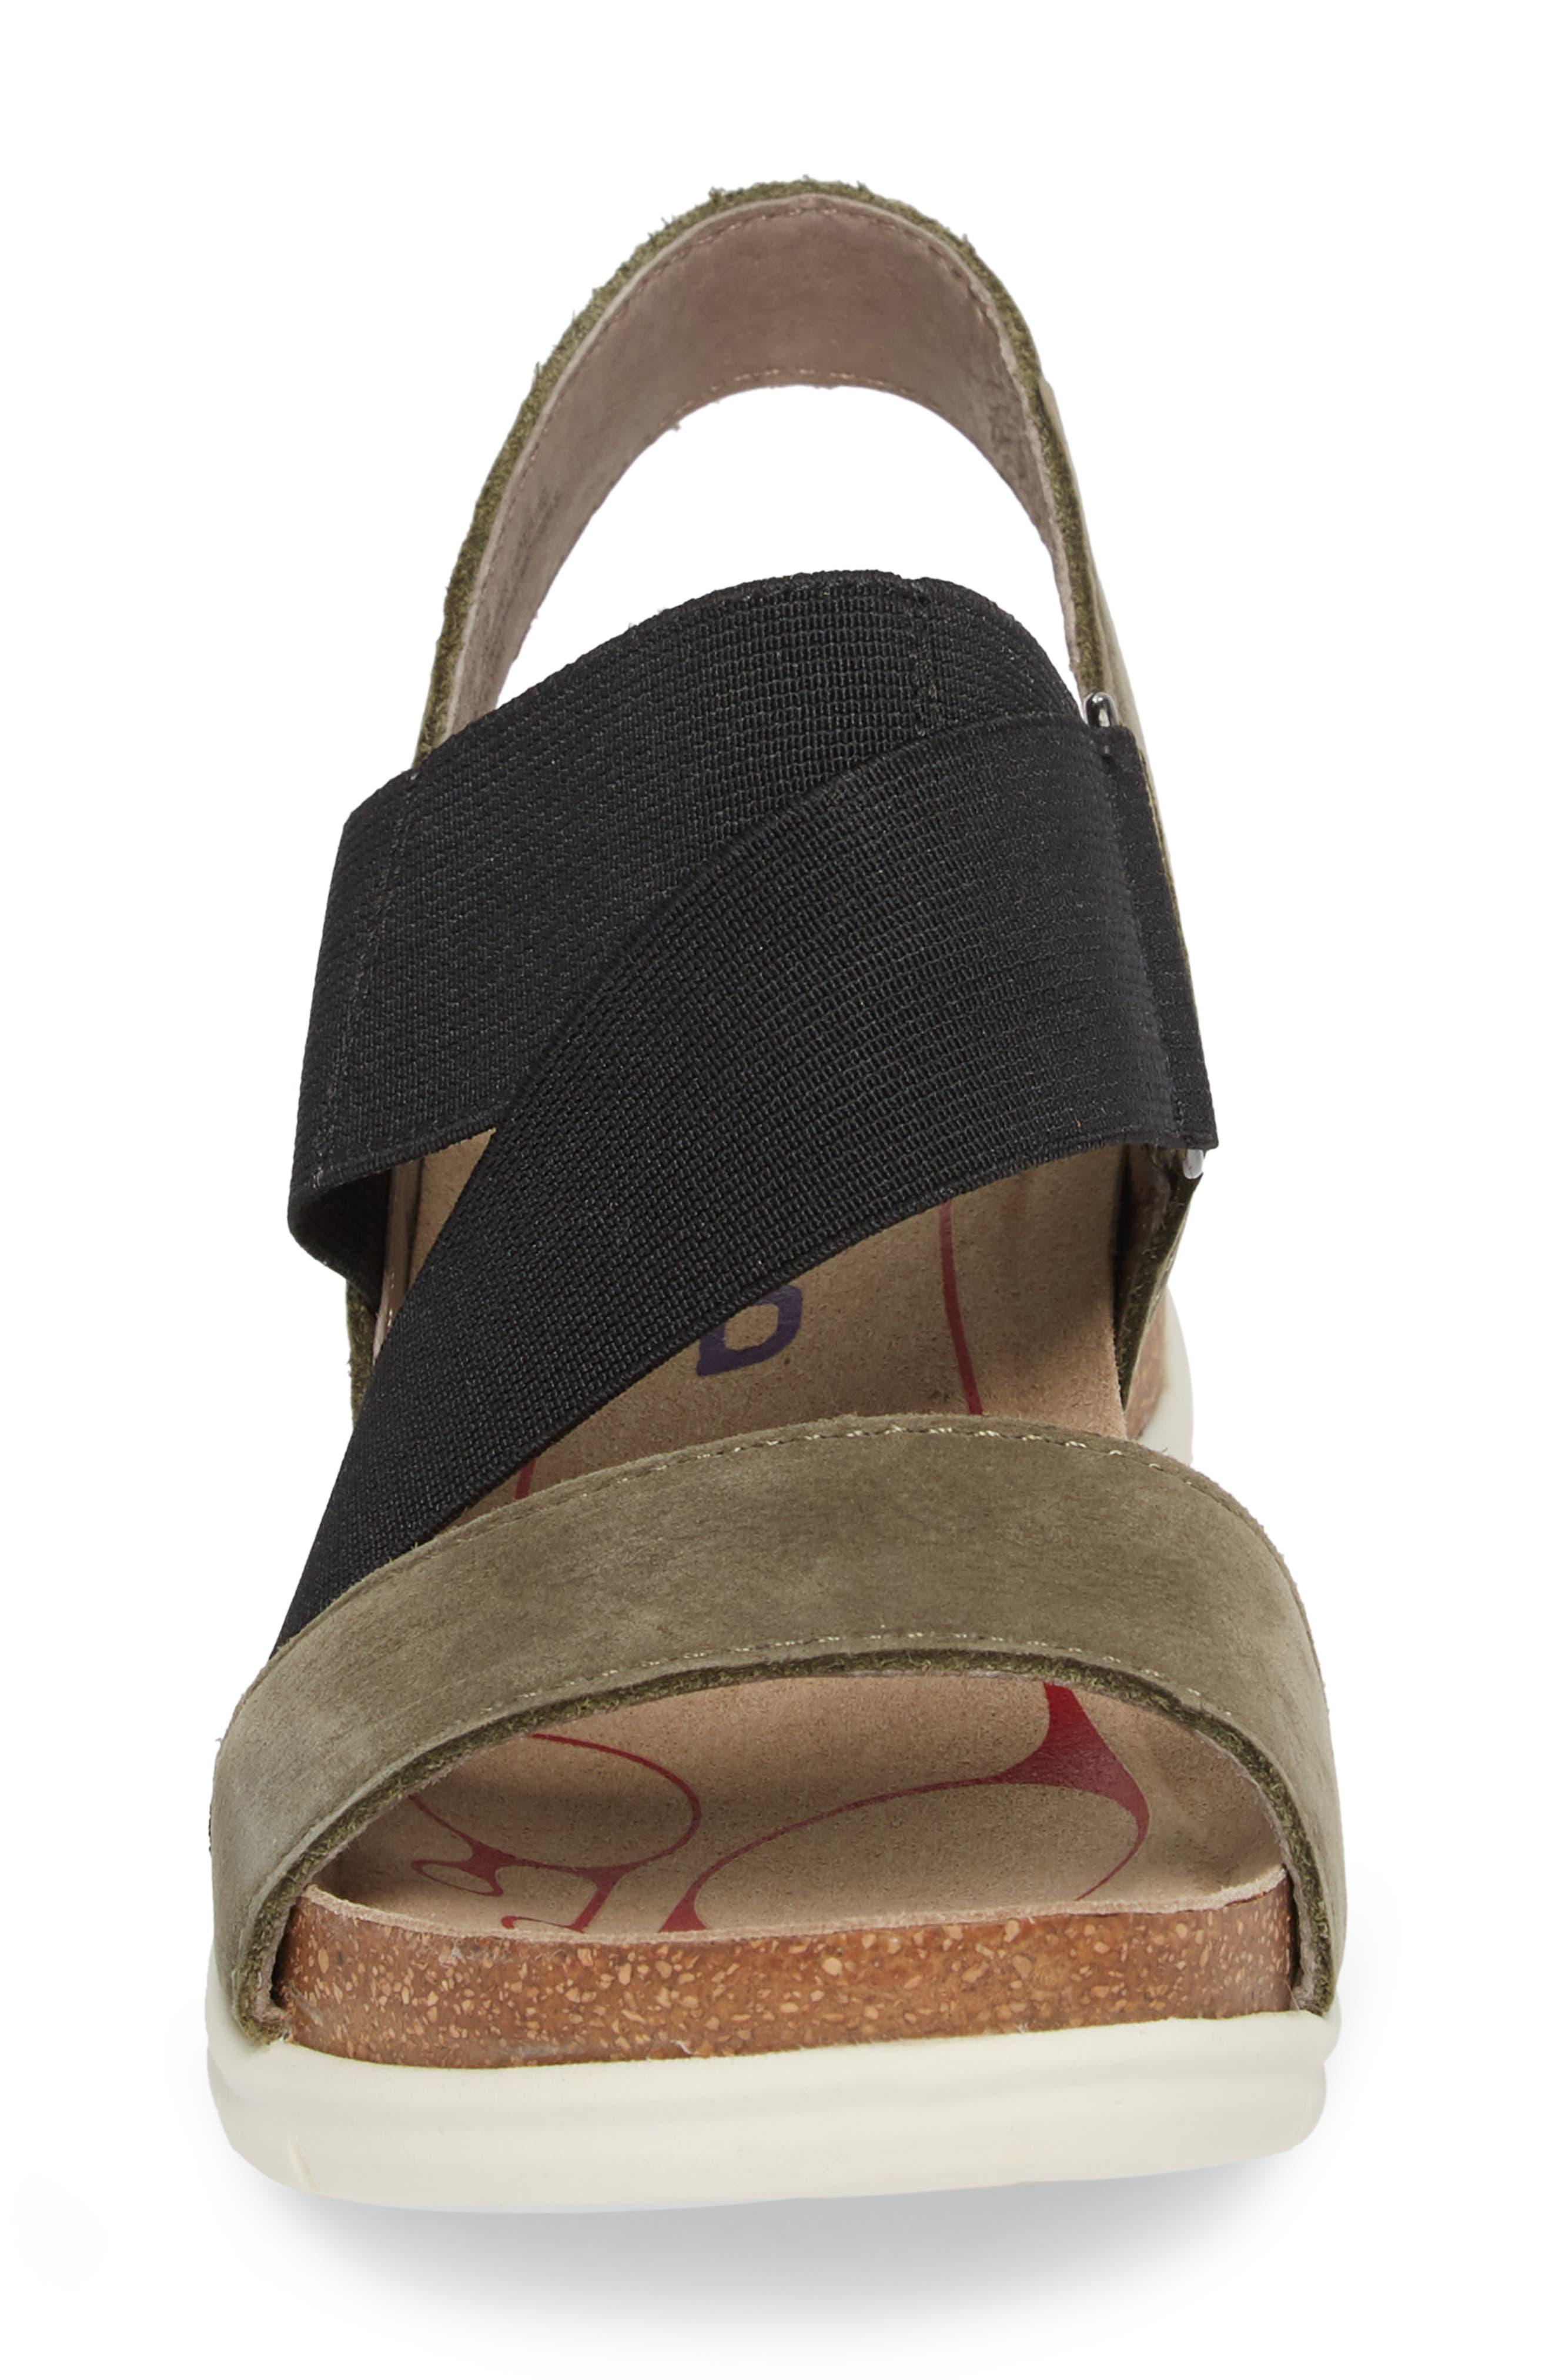 Paisley Wedge Sandal,                             Alternate thumbnail 15, color,